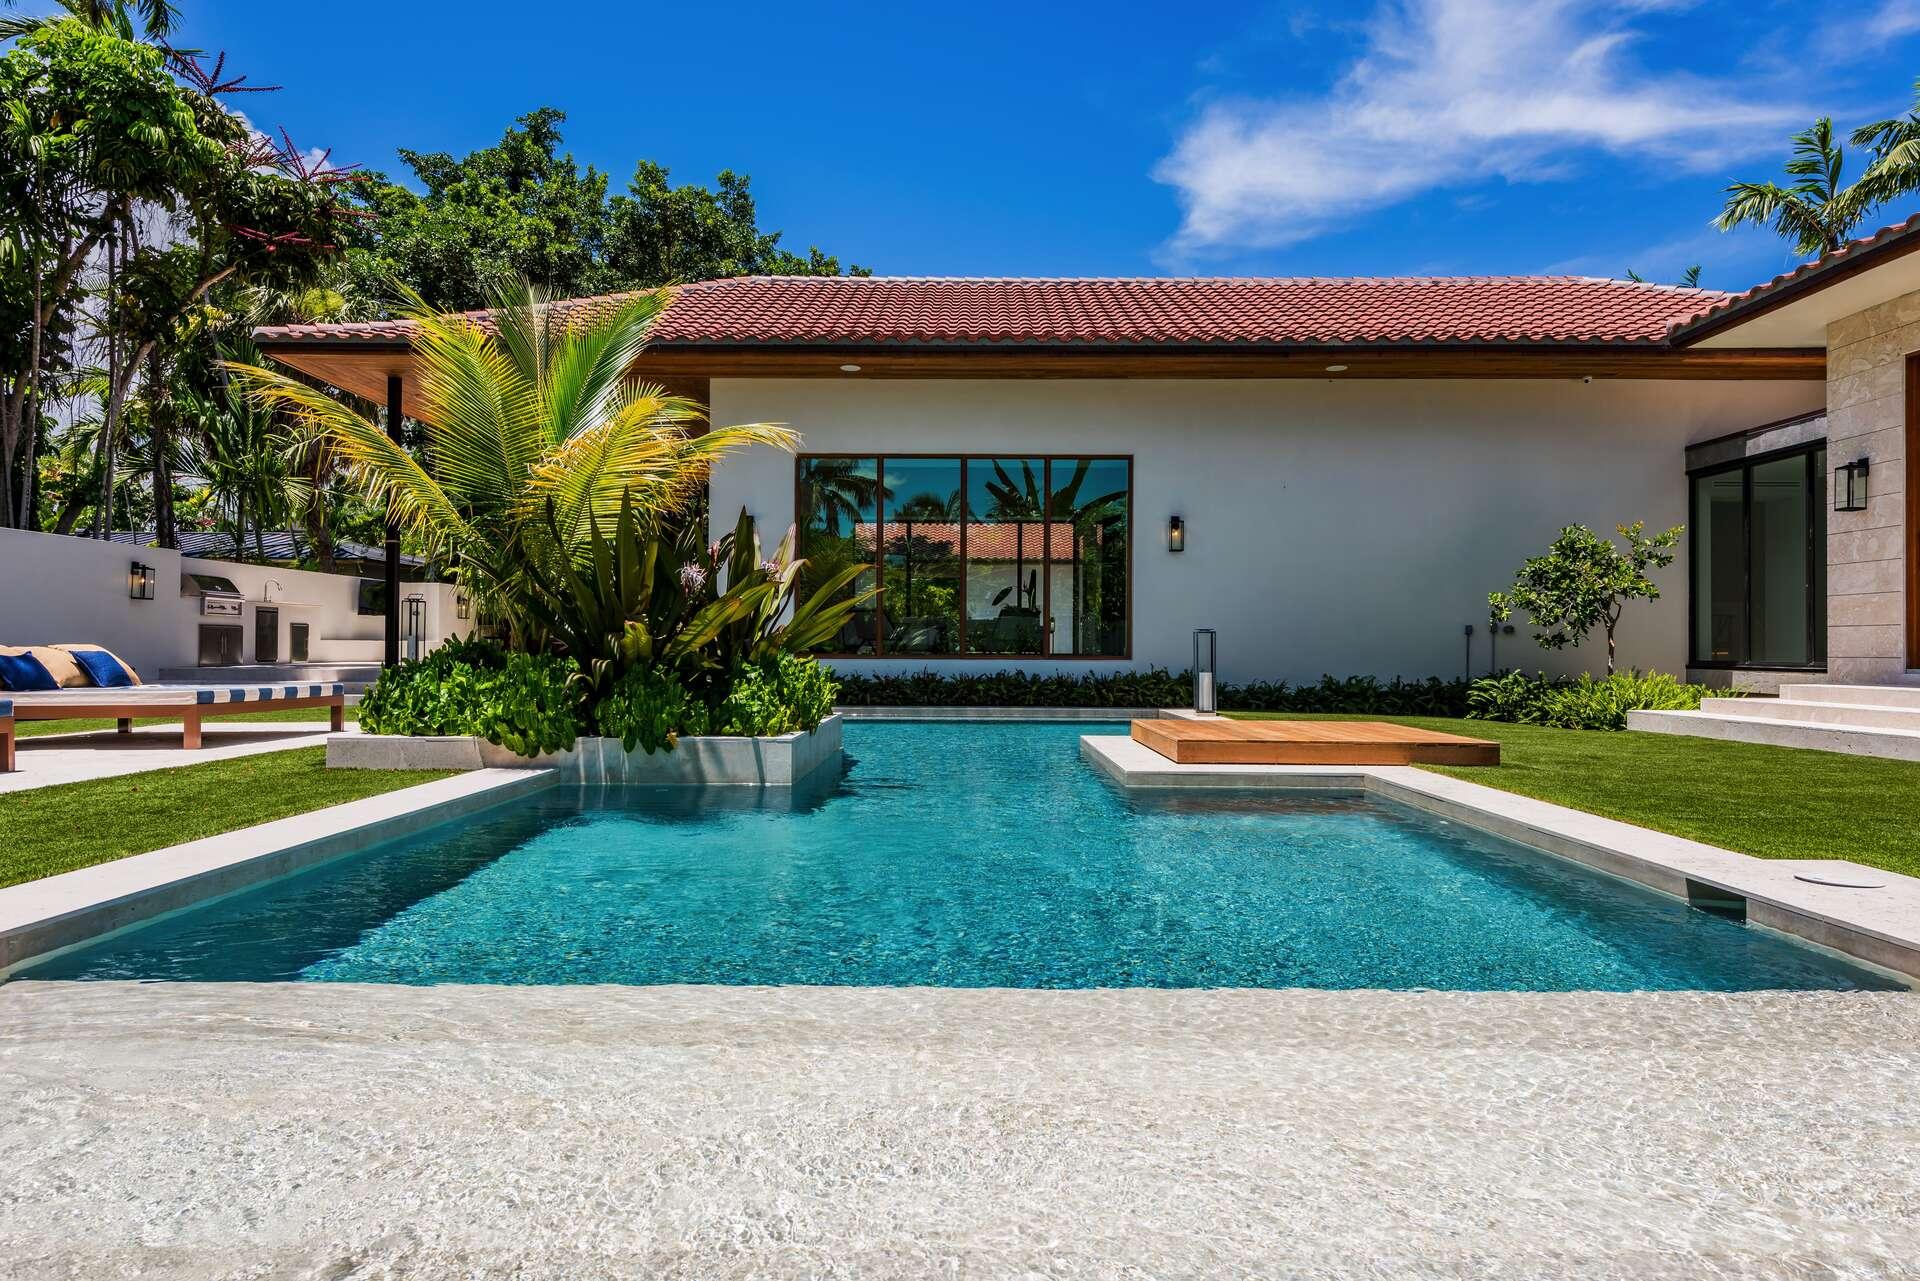 - Villa Marya - Image 1/44